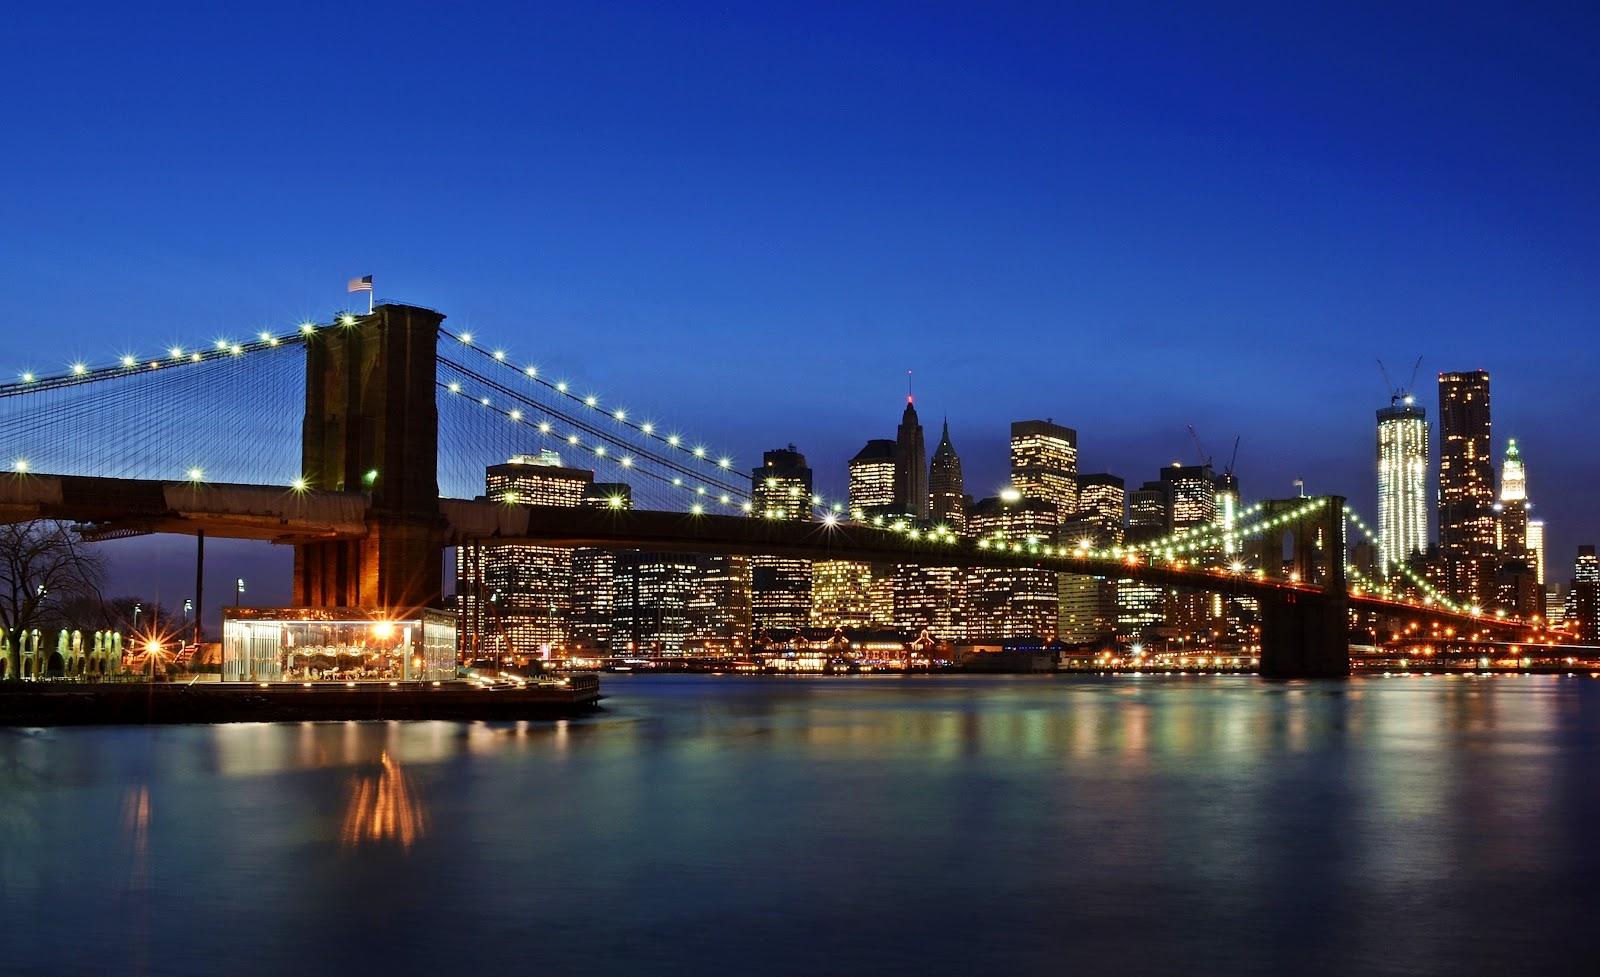 weltb hne abenteuer new york part 6 brooklyn bridge. Black Bedroom Furniture Sets. Home Design Ideas